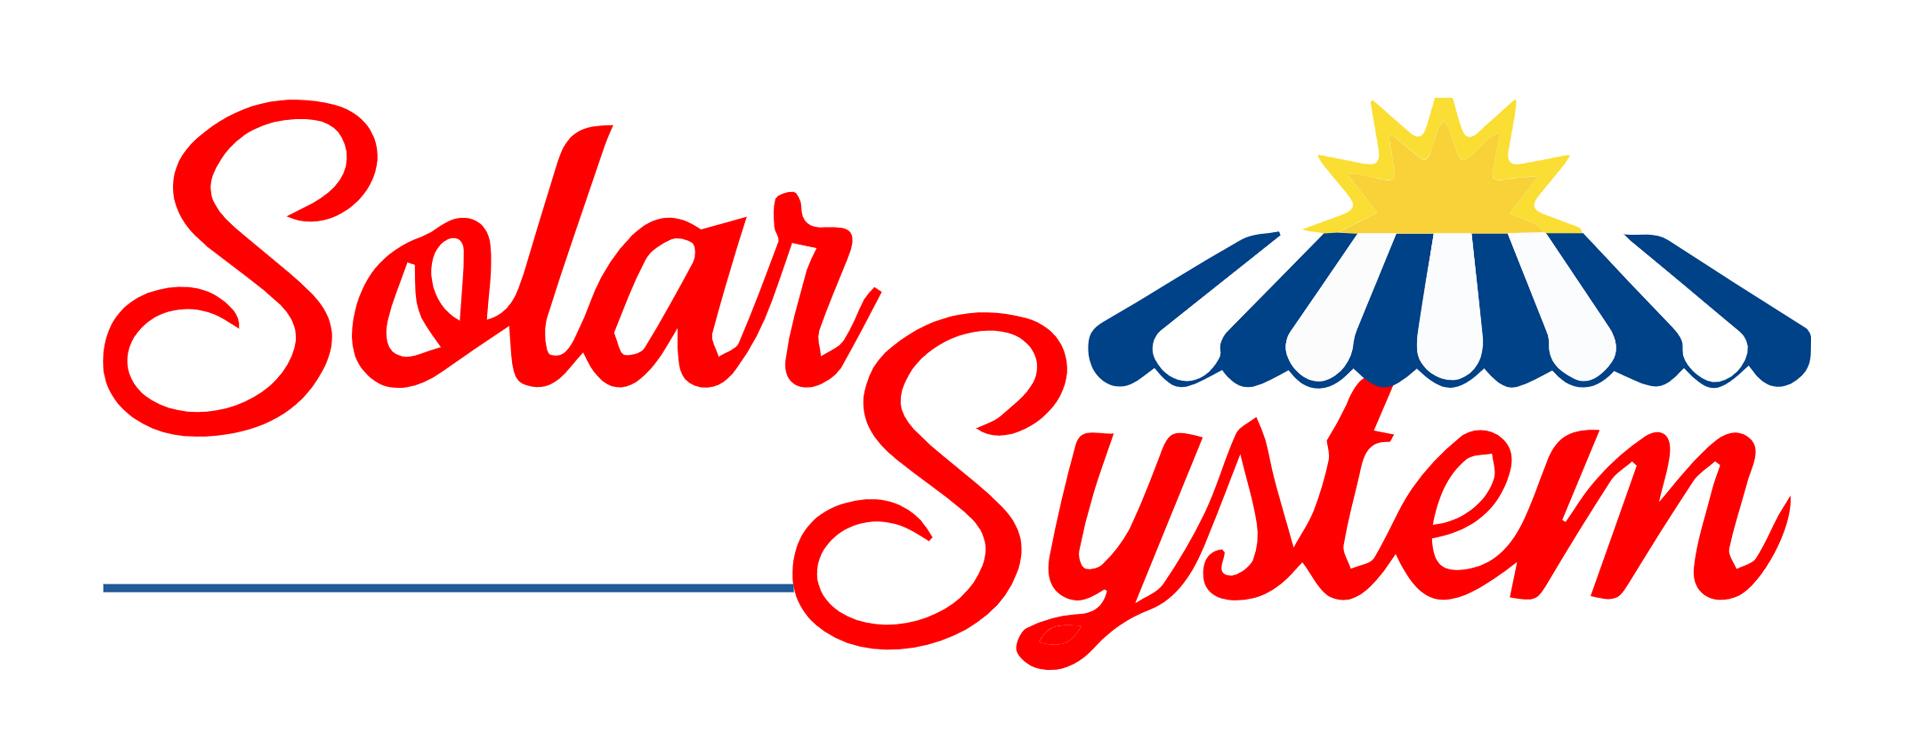 Solar System Caltanissetta Logo